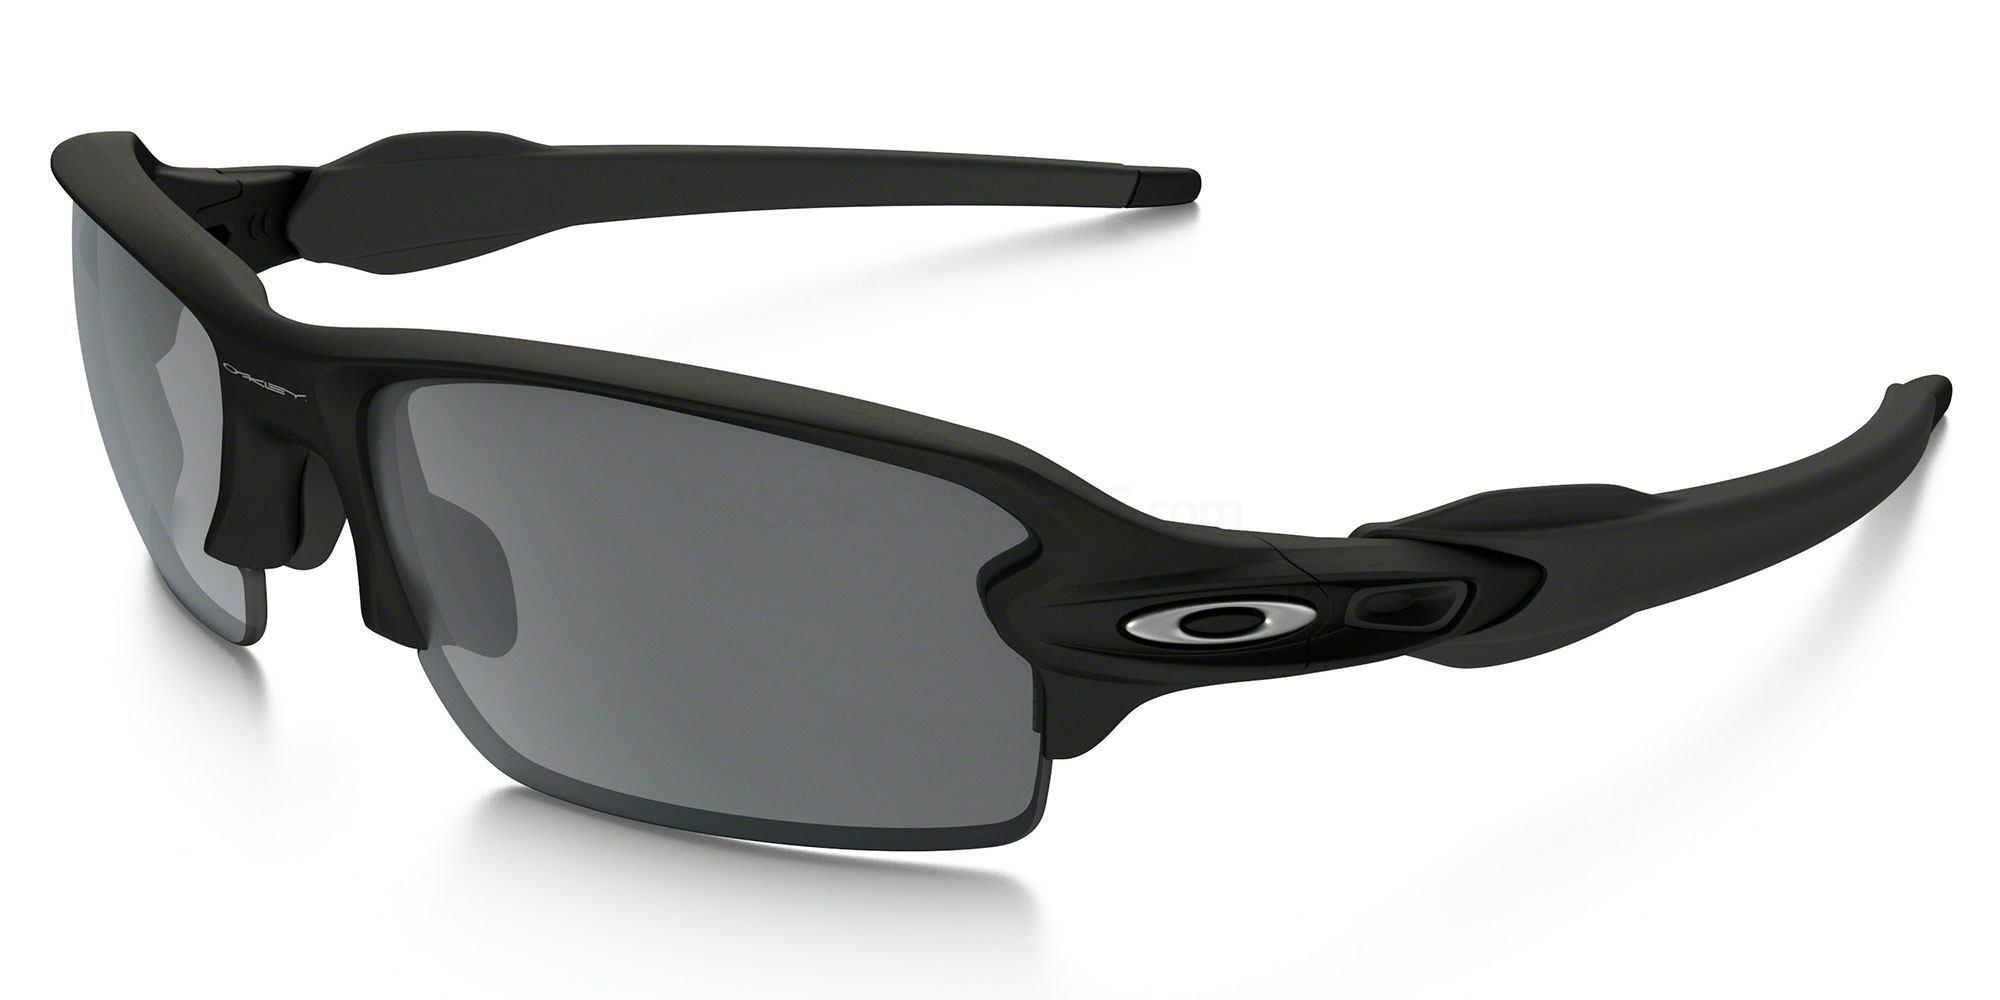 929501 OO9295 FLAK 2.0 Sunglasses, Oakley